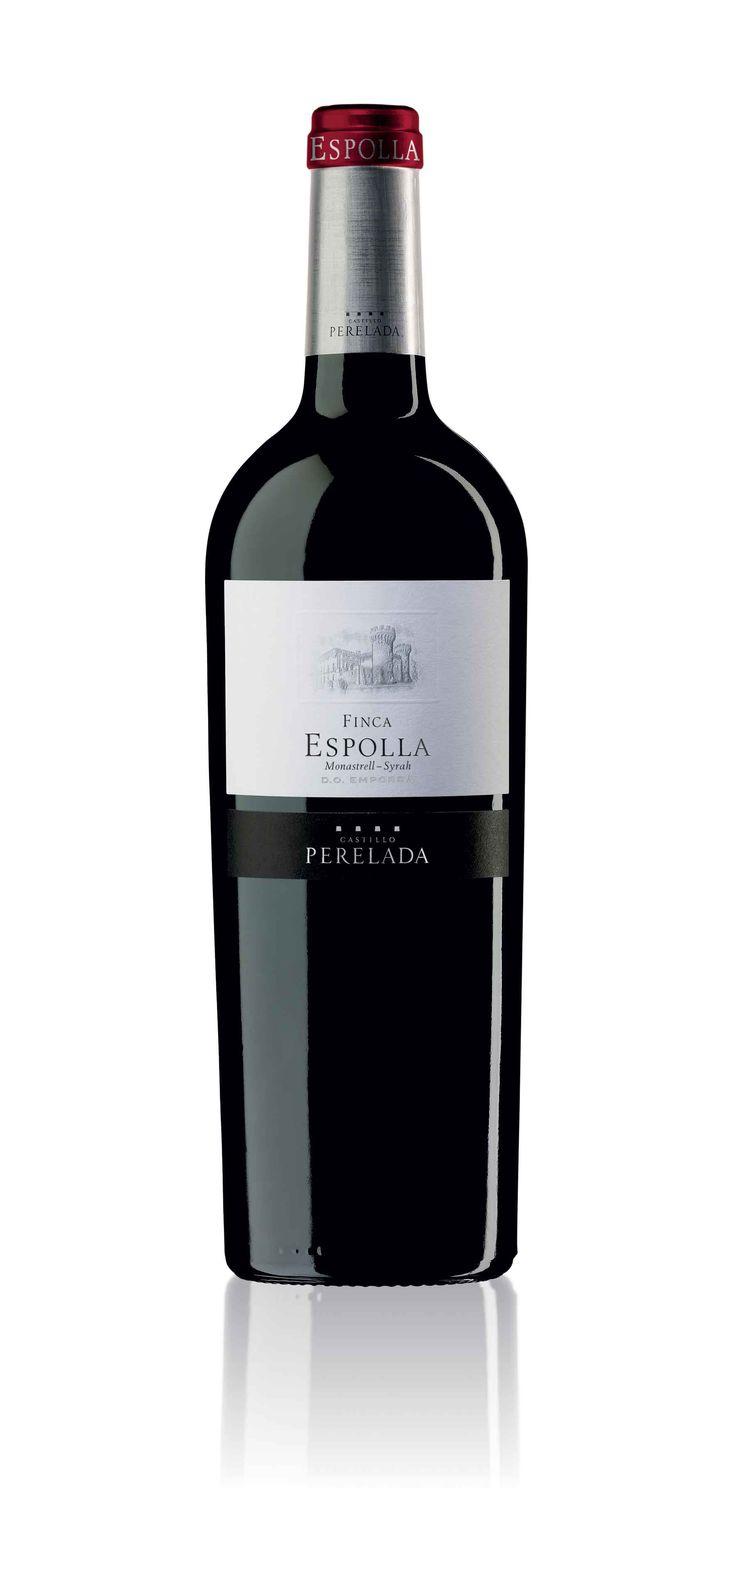 Perelada Finca Espolla http://www.perelada.com/vinos/vinos-de-finca/finca-espolla/